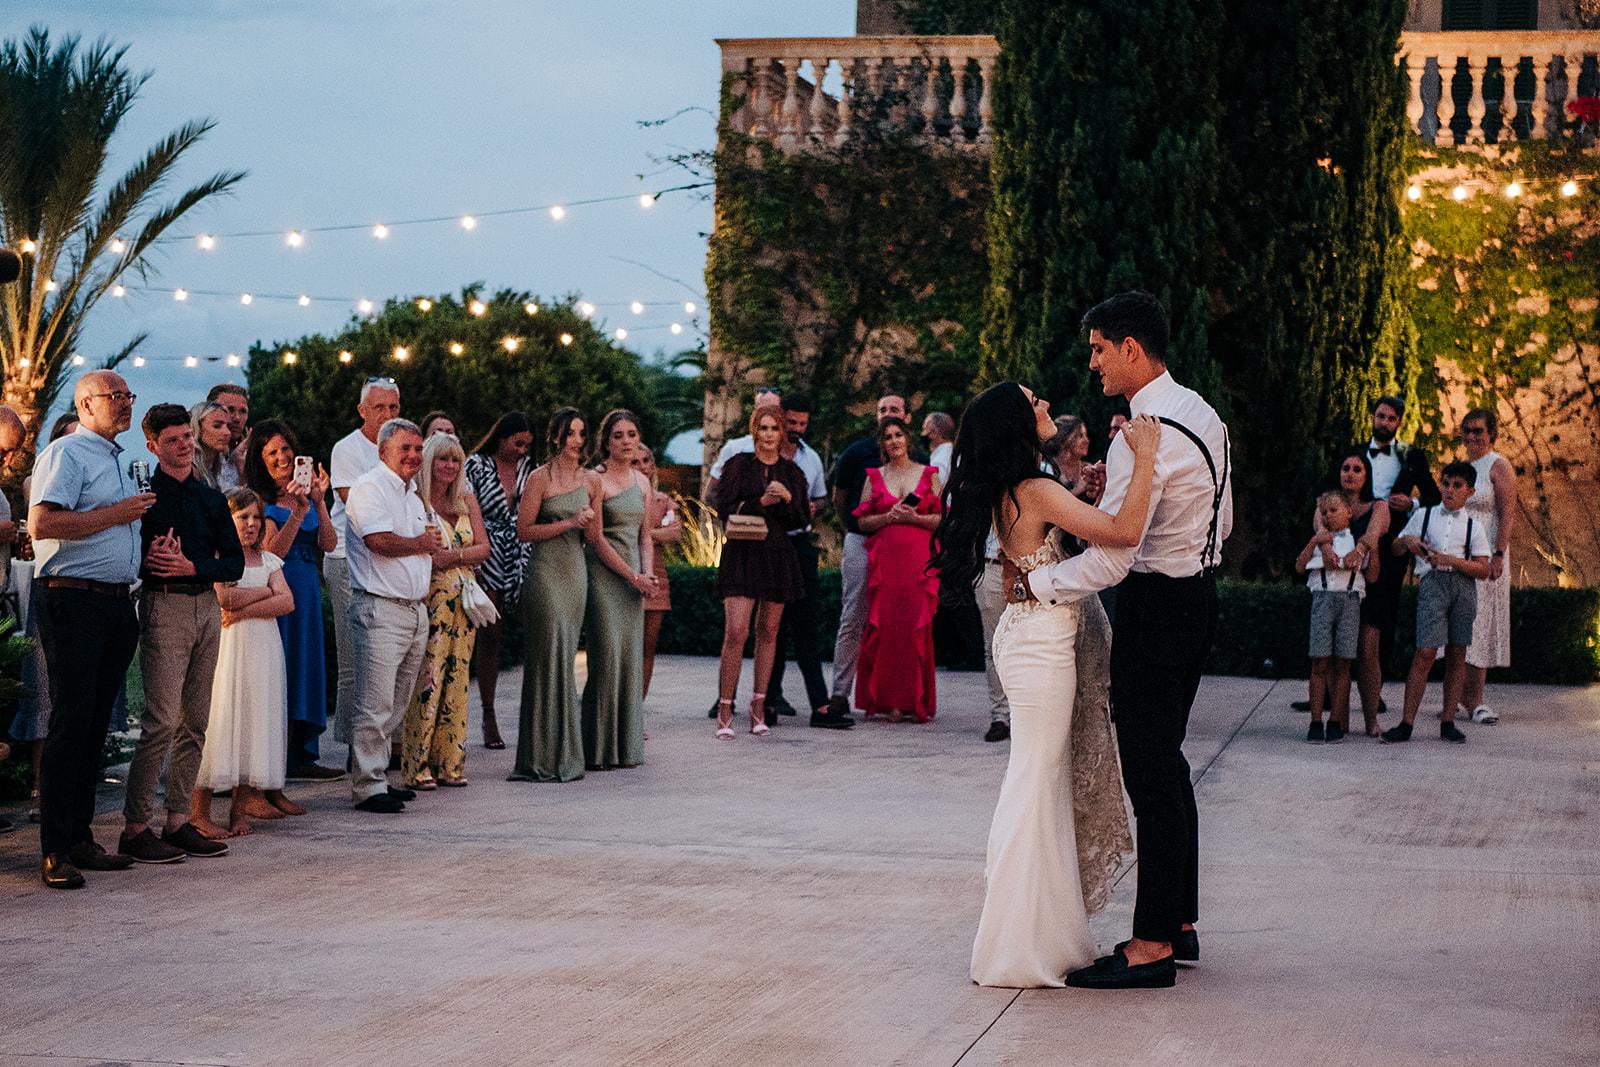 Rustic styling wedding